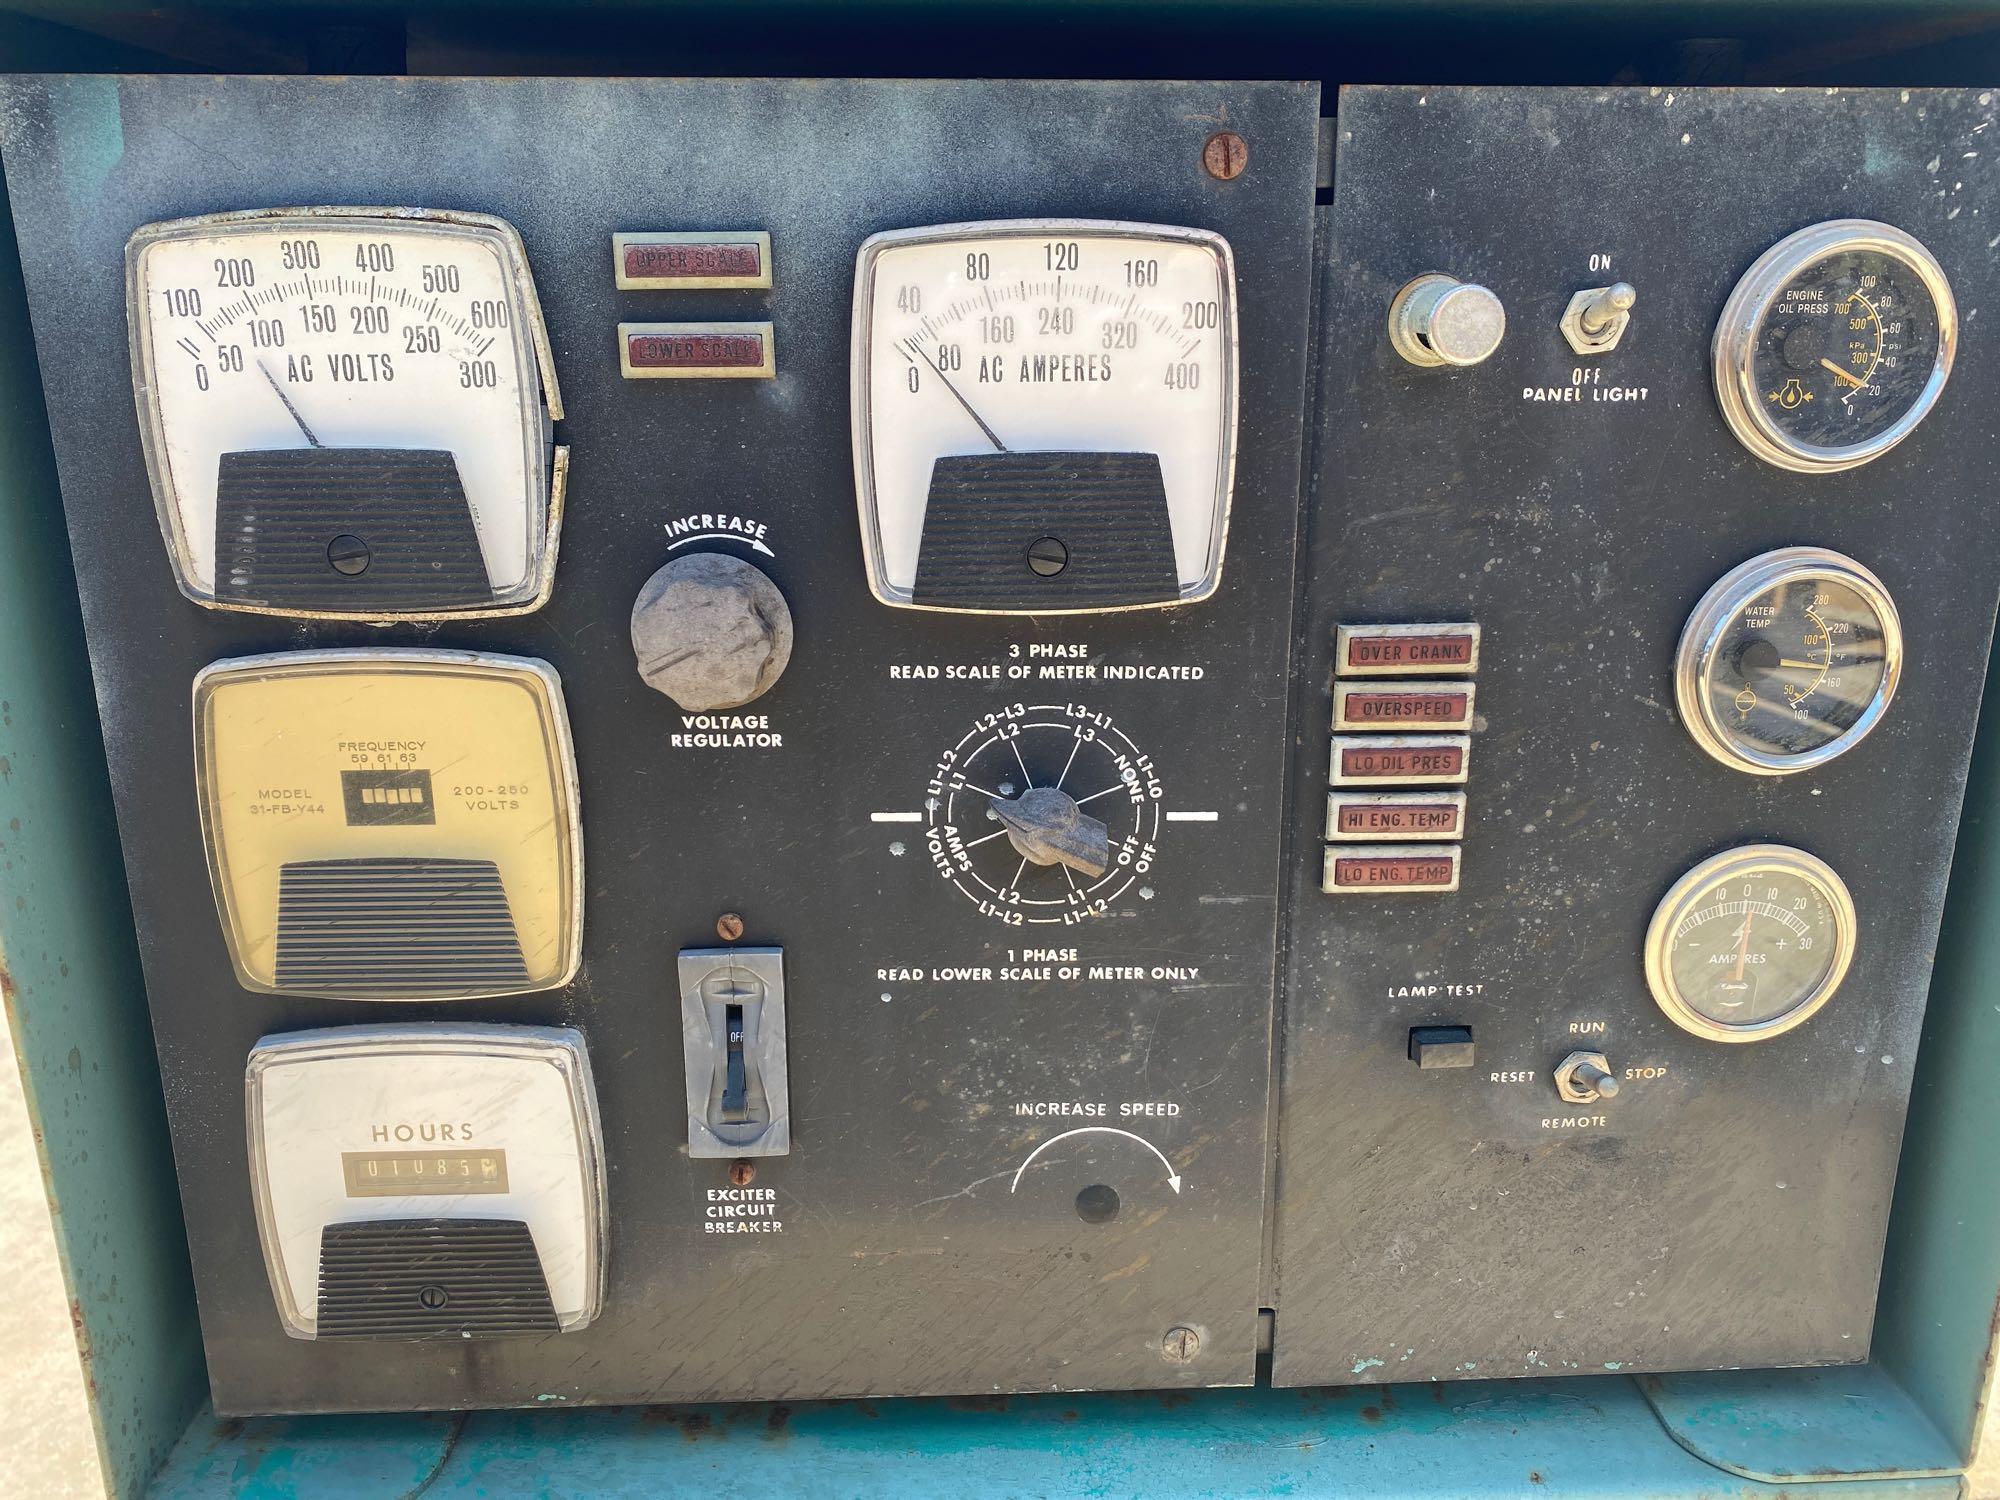 ONAN 90 DYC GENERATOR, 90 KW, 112KVA, 1085 HOURS SHOWING - Image 9 of 11